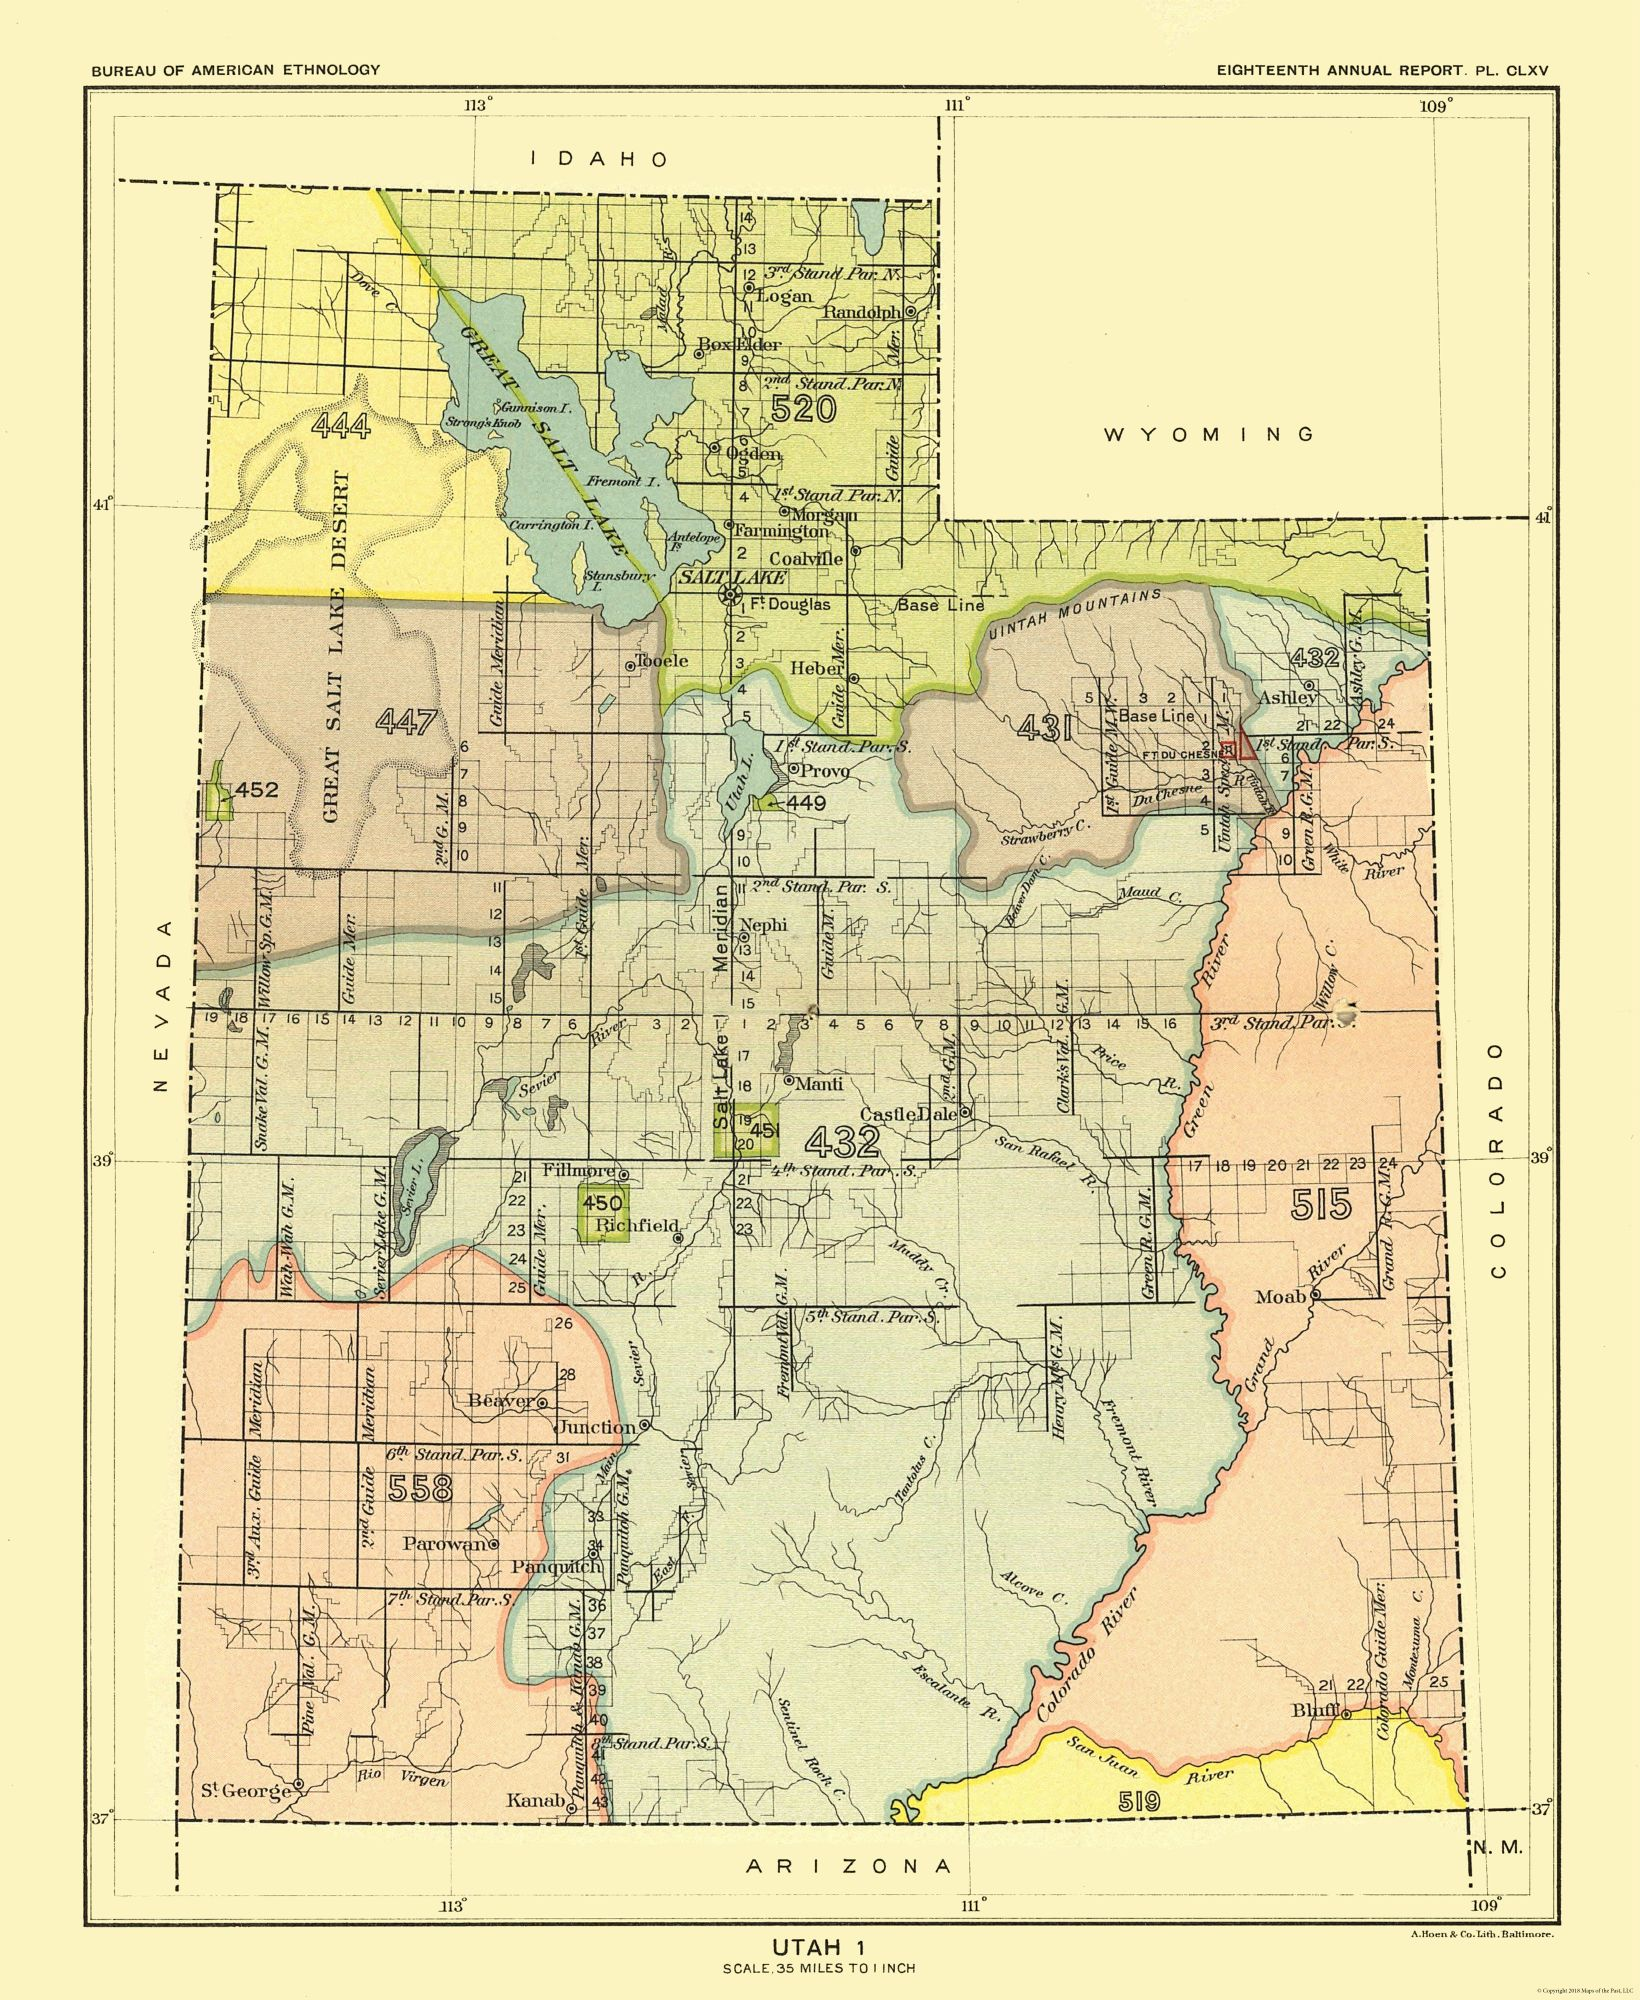 Old State Map - Utah - Great Salt Lake - Hoen 1896 - 23 x 28.06